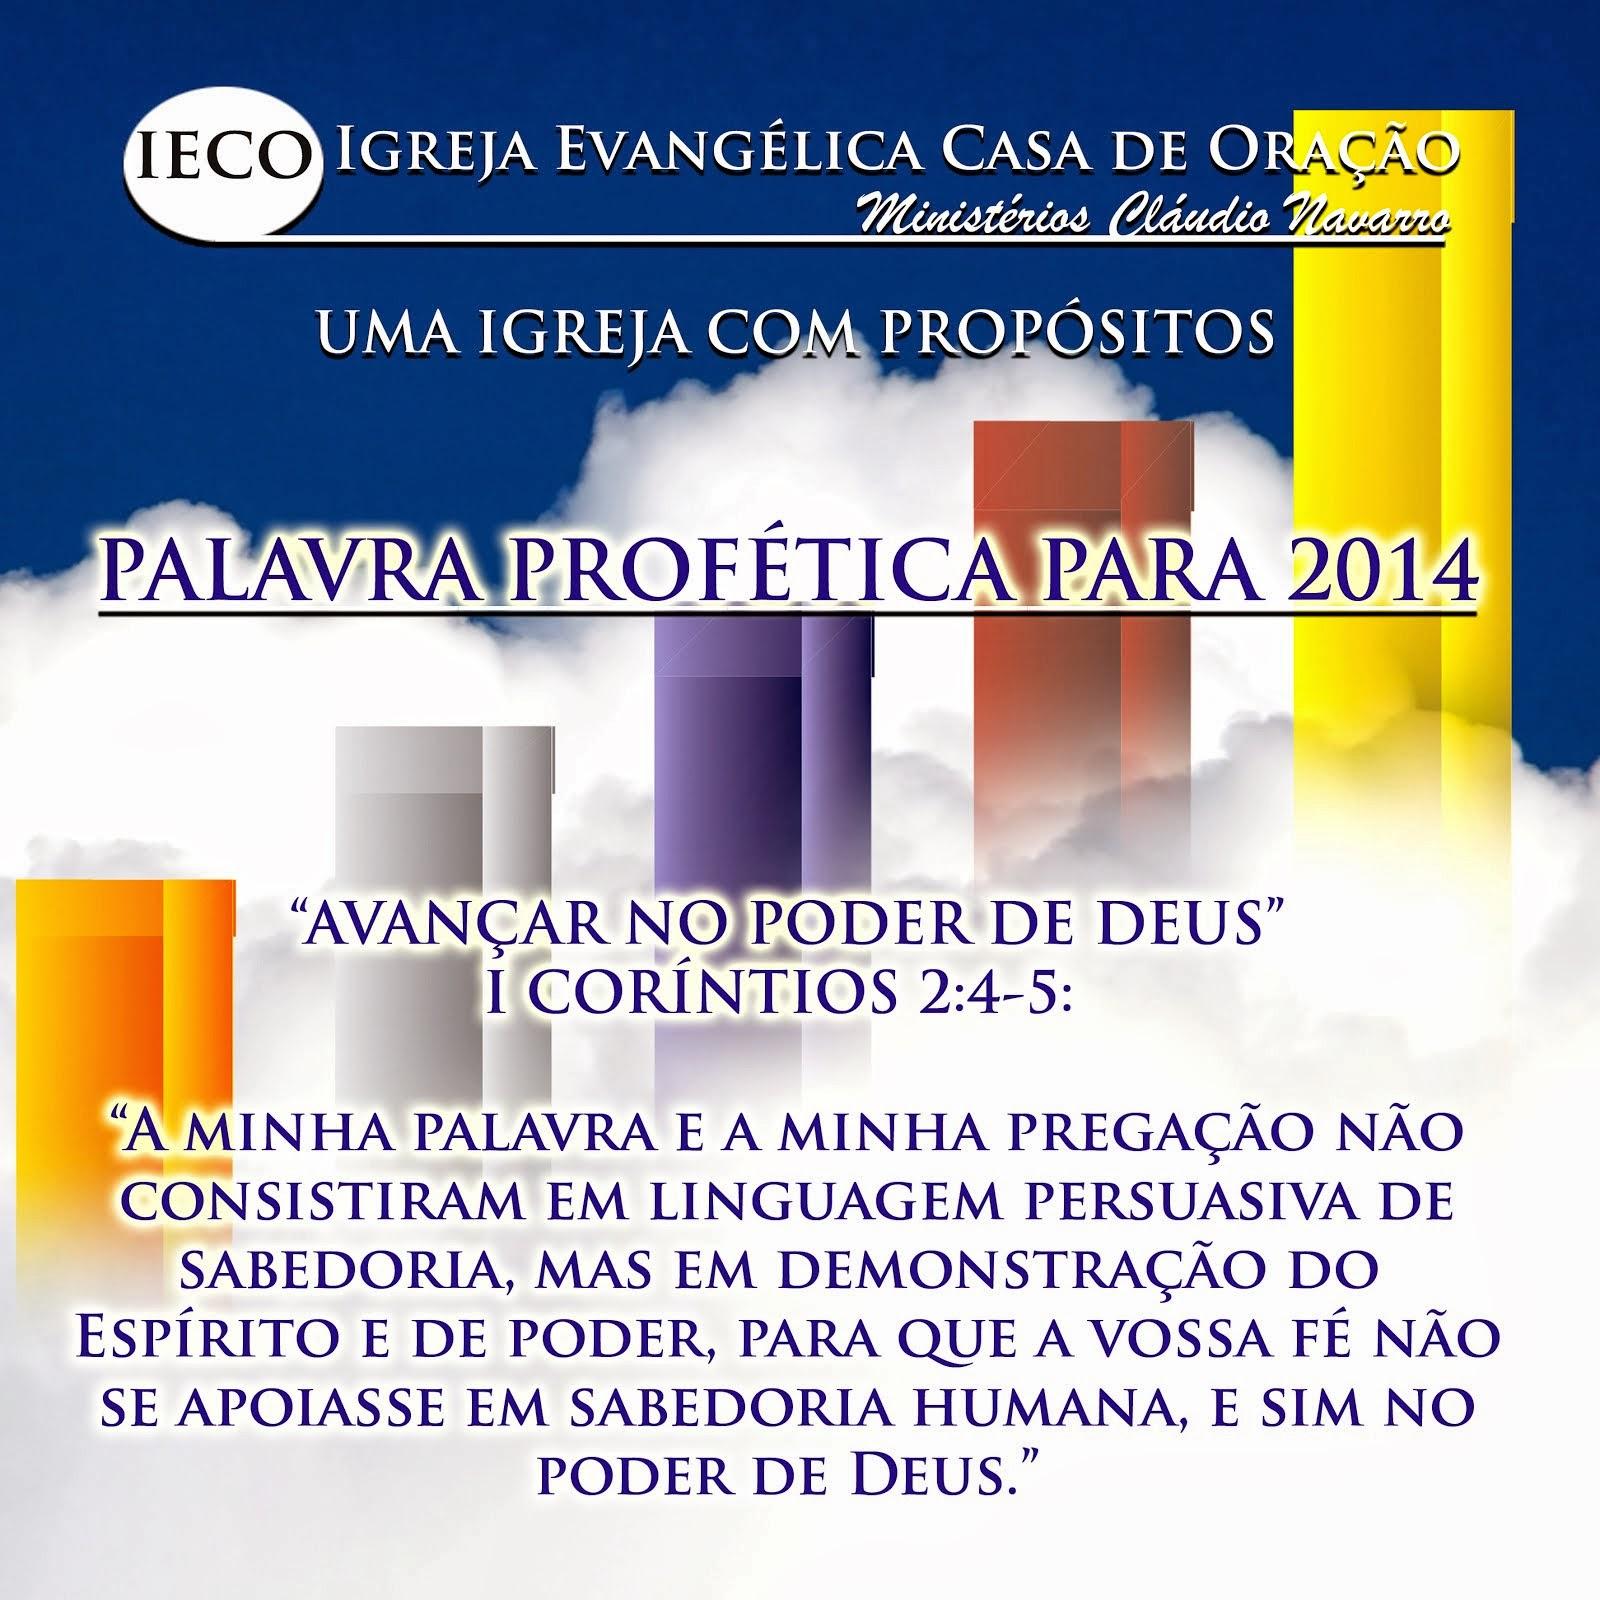 PALAVRA PROFÉTICA PARA 2014